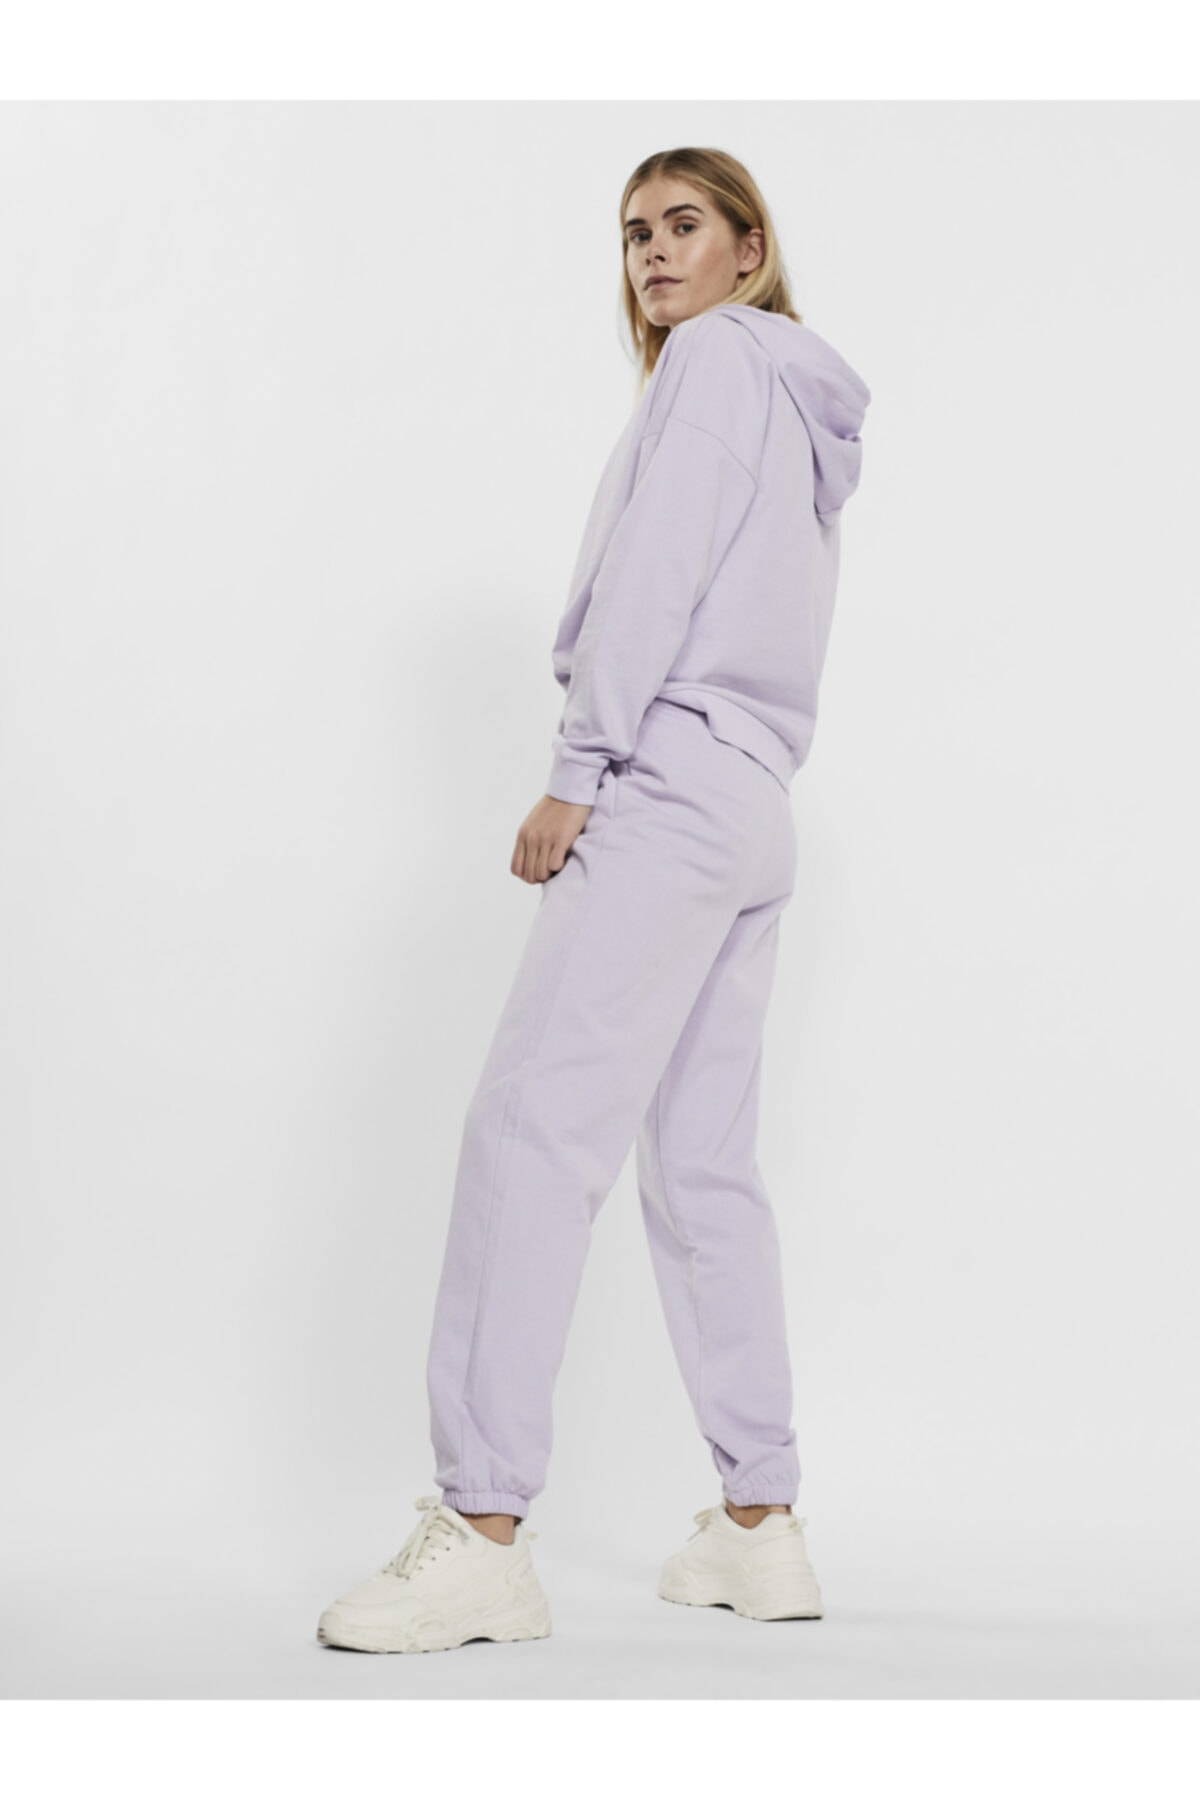 Vero Moda Kadın Pastel Lilac Paçası Lastikli Yüksek Bel Jogger Pantolon 10251096 Vmoctavıa 2